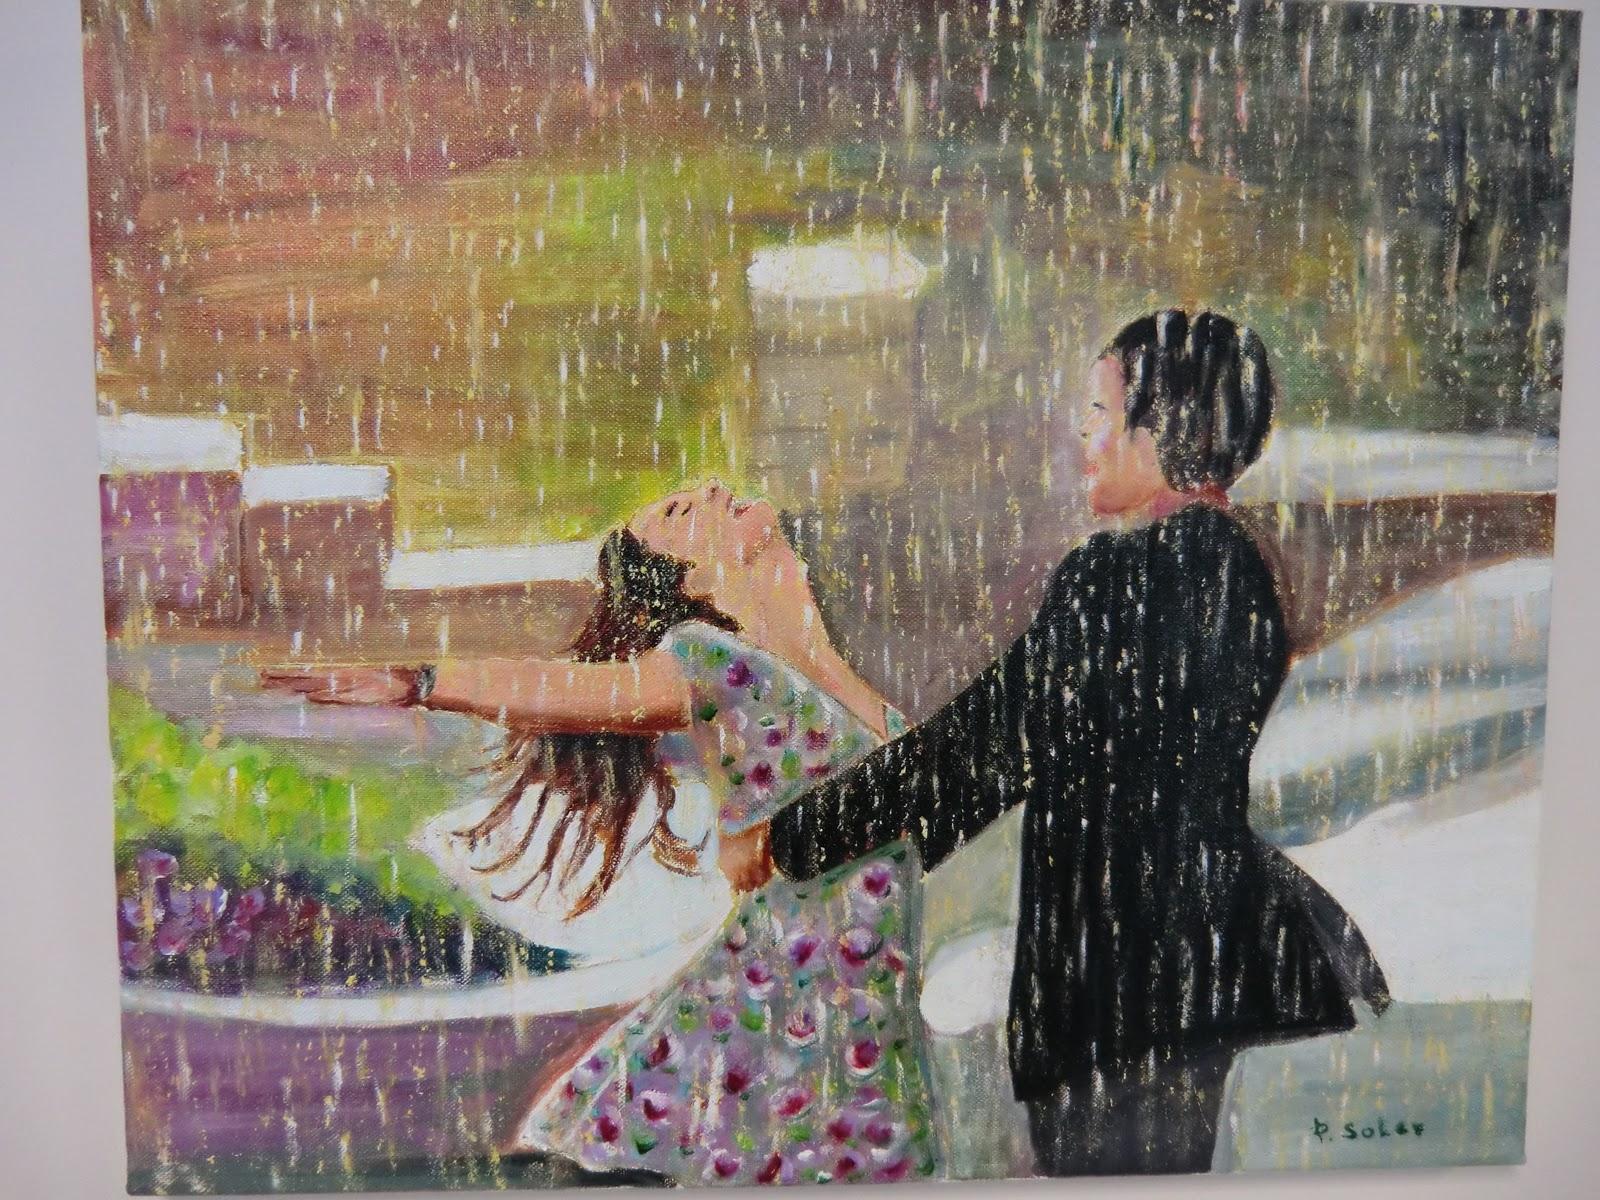 Pepita soler escobar pareja en lluvia - Cuadros de parejas ...